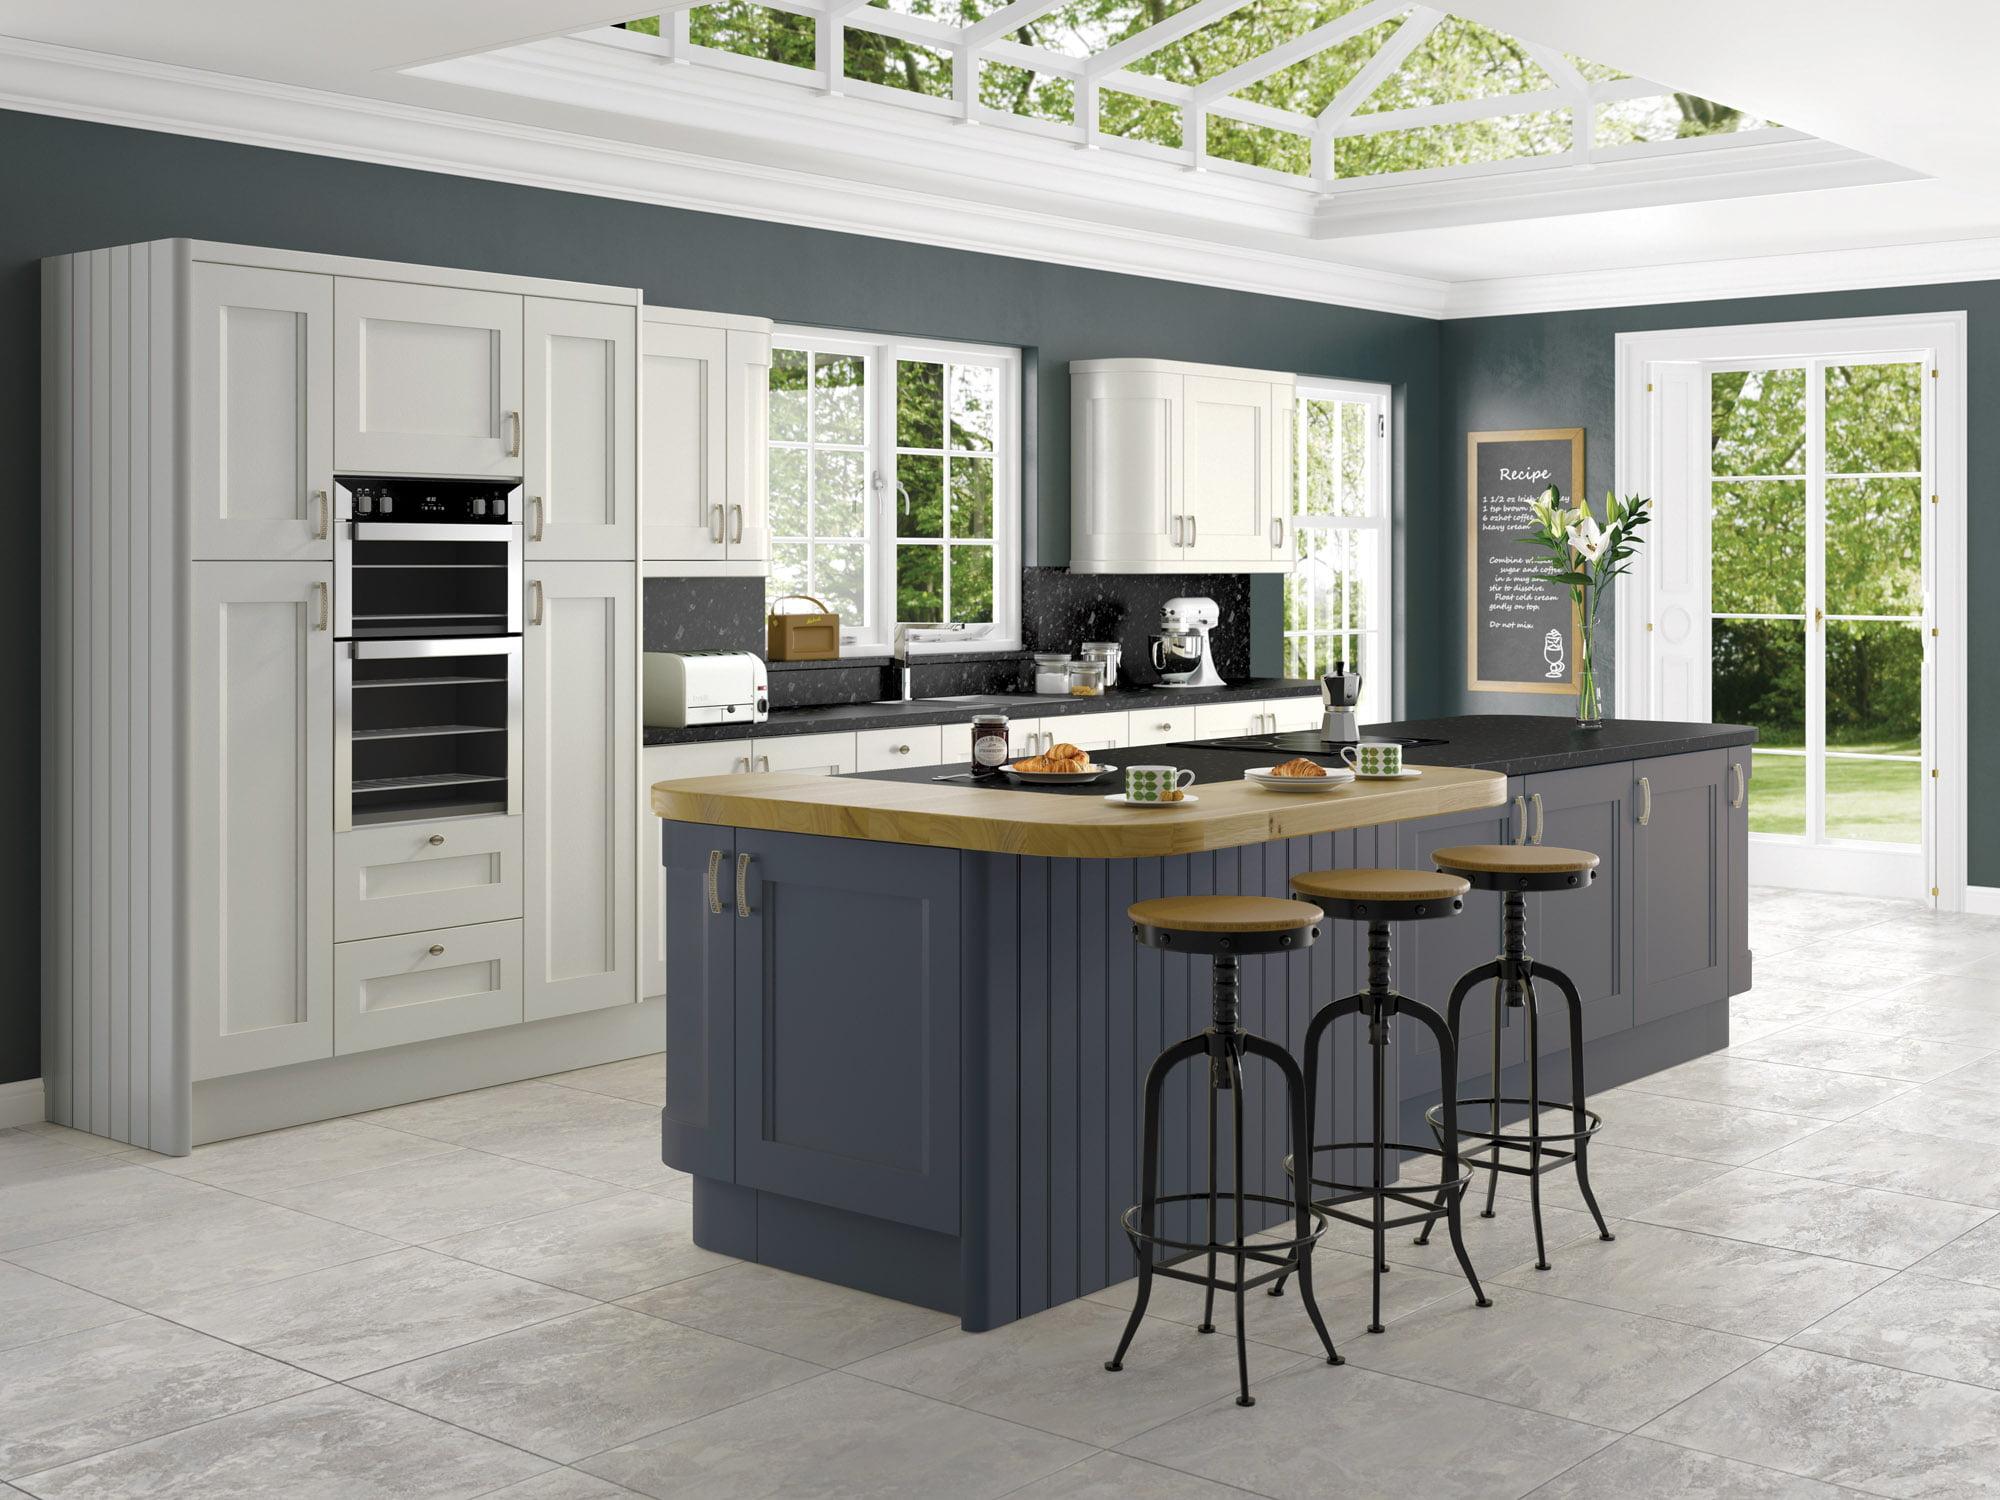 haddington storm grey with anthracite in frame kitchen